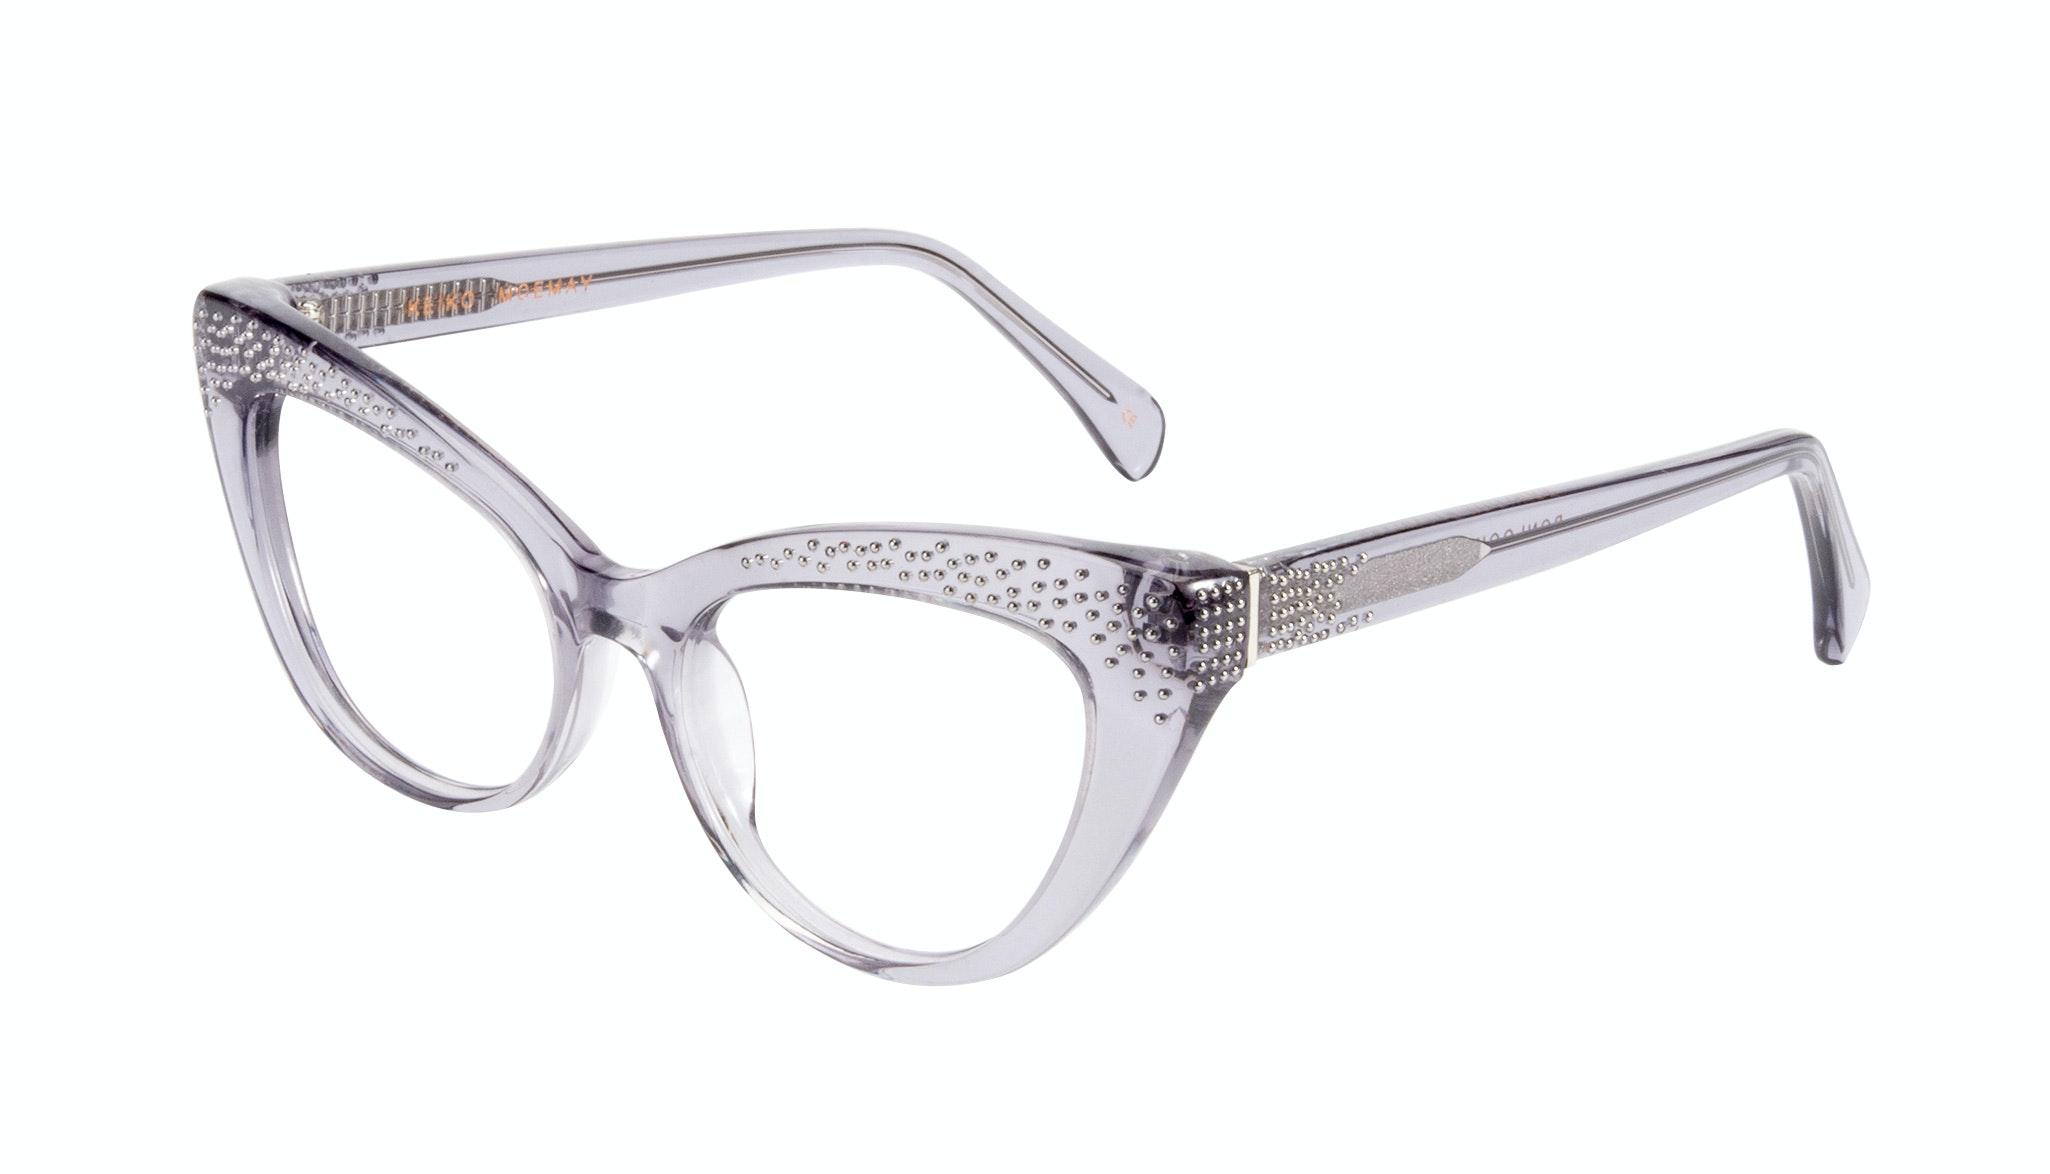 Affordable Fashion Glasses Cat Eye Daring Cateye Eyeglasses Women Keiko Moe May Tilt